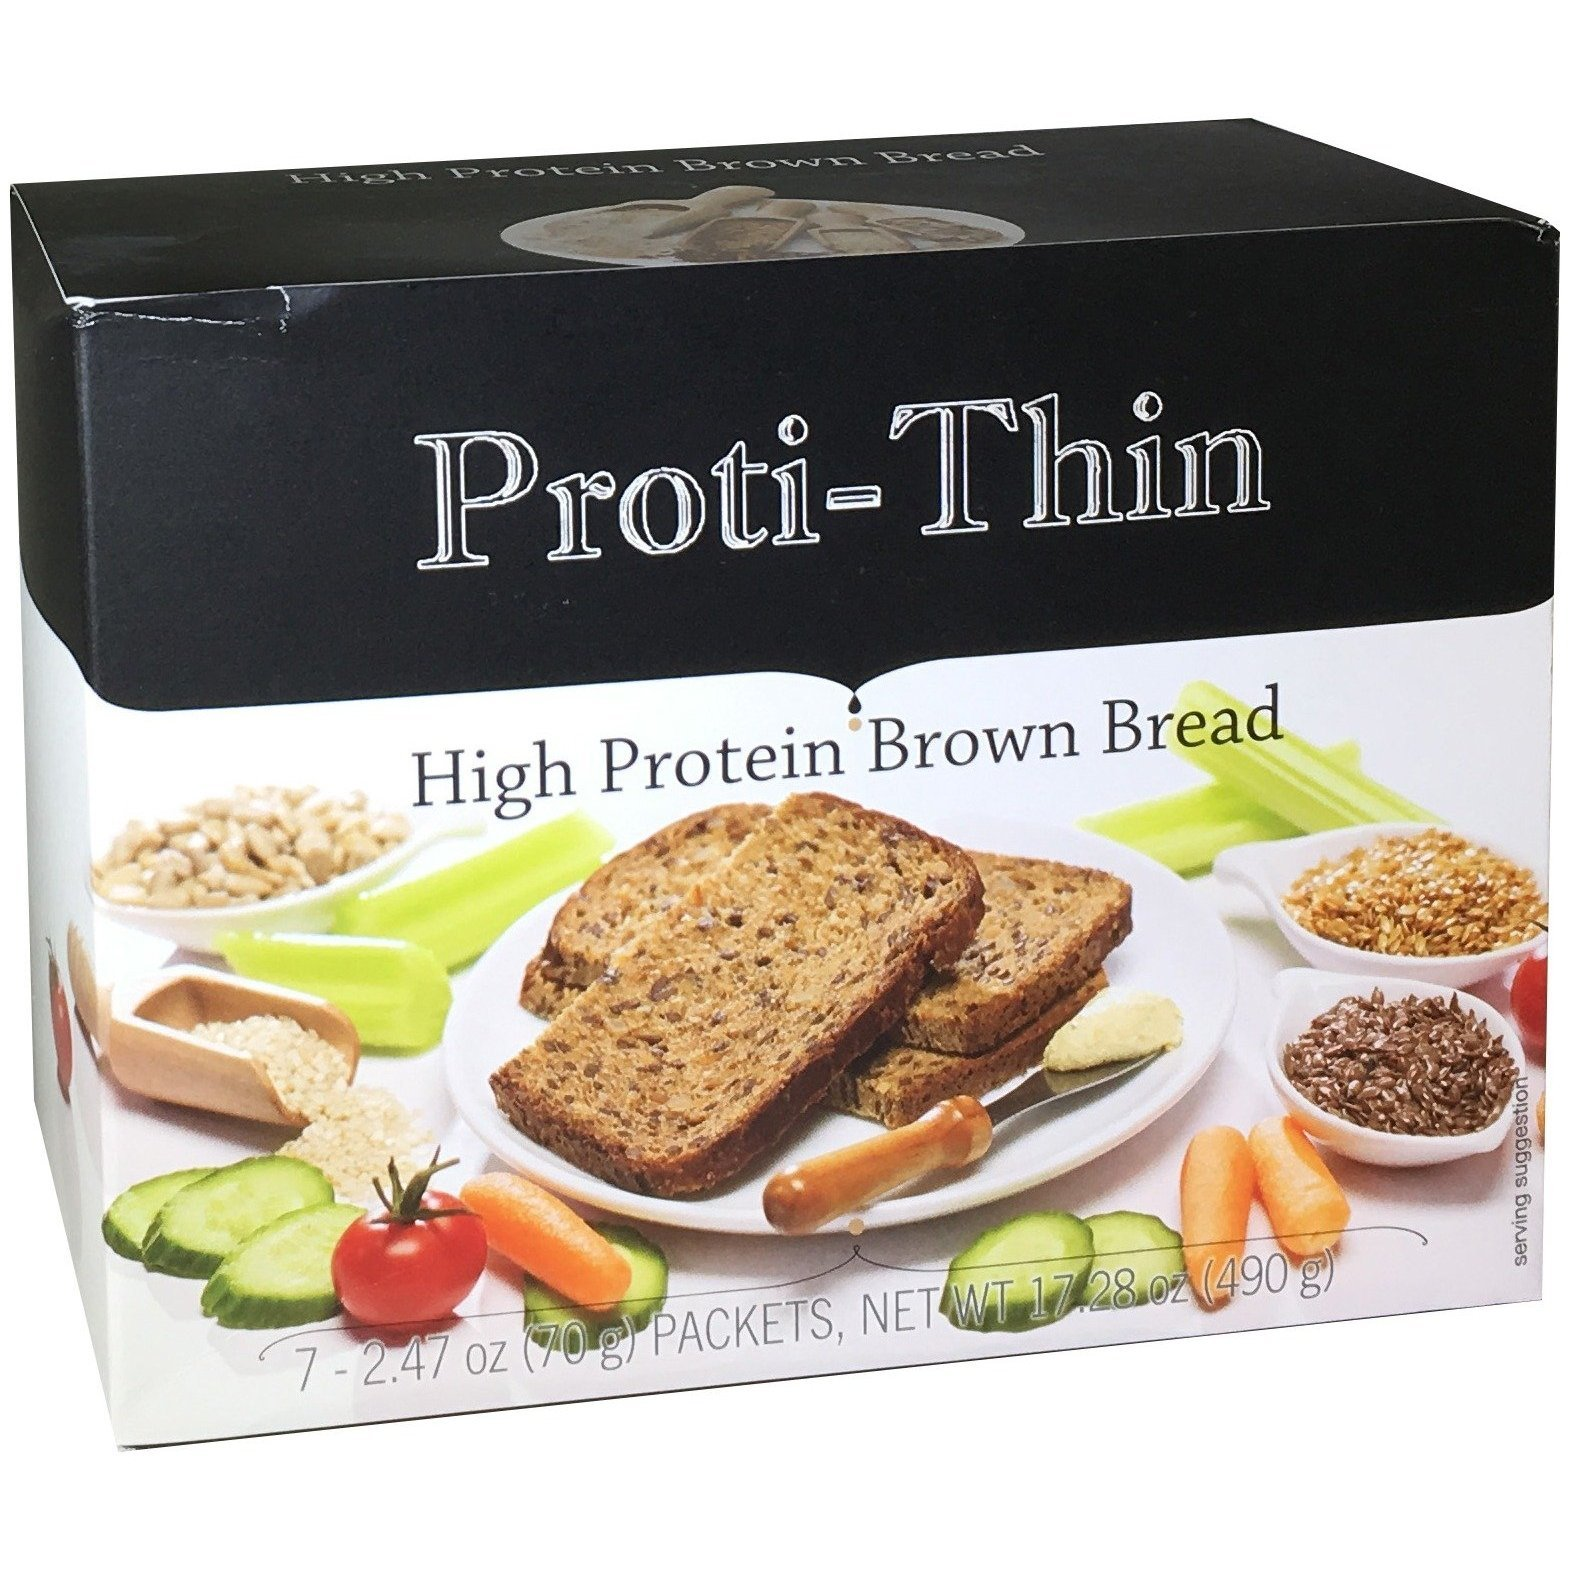 Proti-Thin - High Protein Brown Bread - 15g Protein - High Fiber - Low Net Carb -Diet Bread (7/Box)